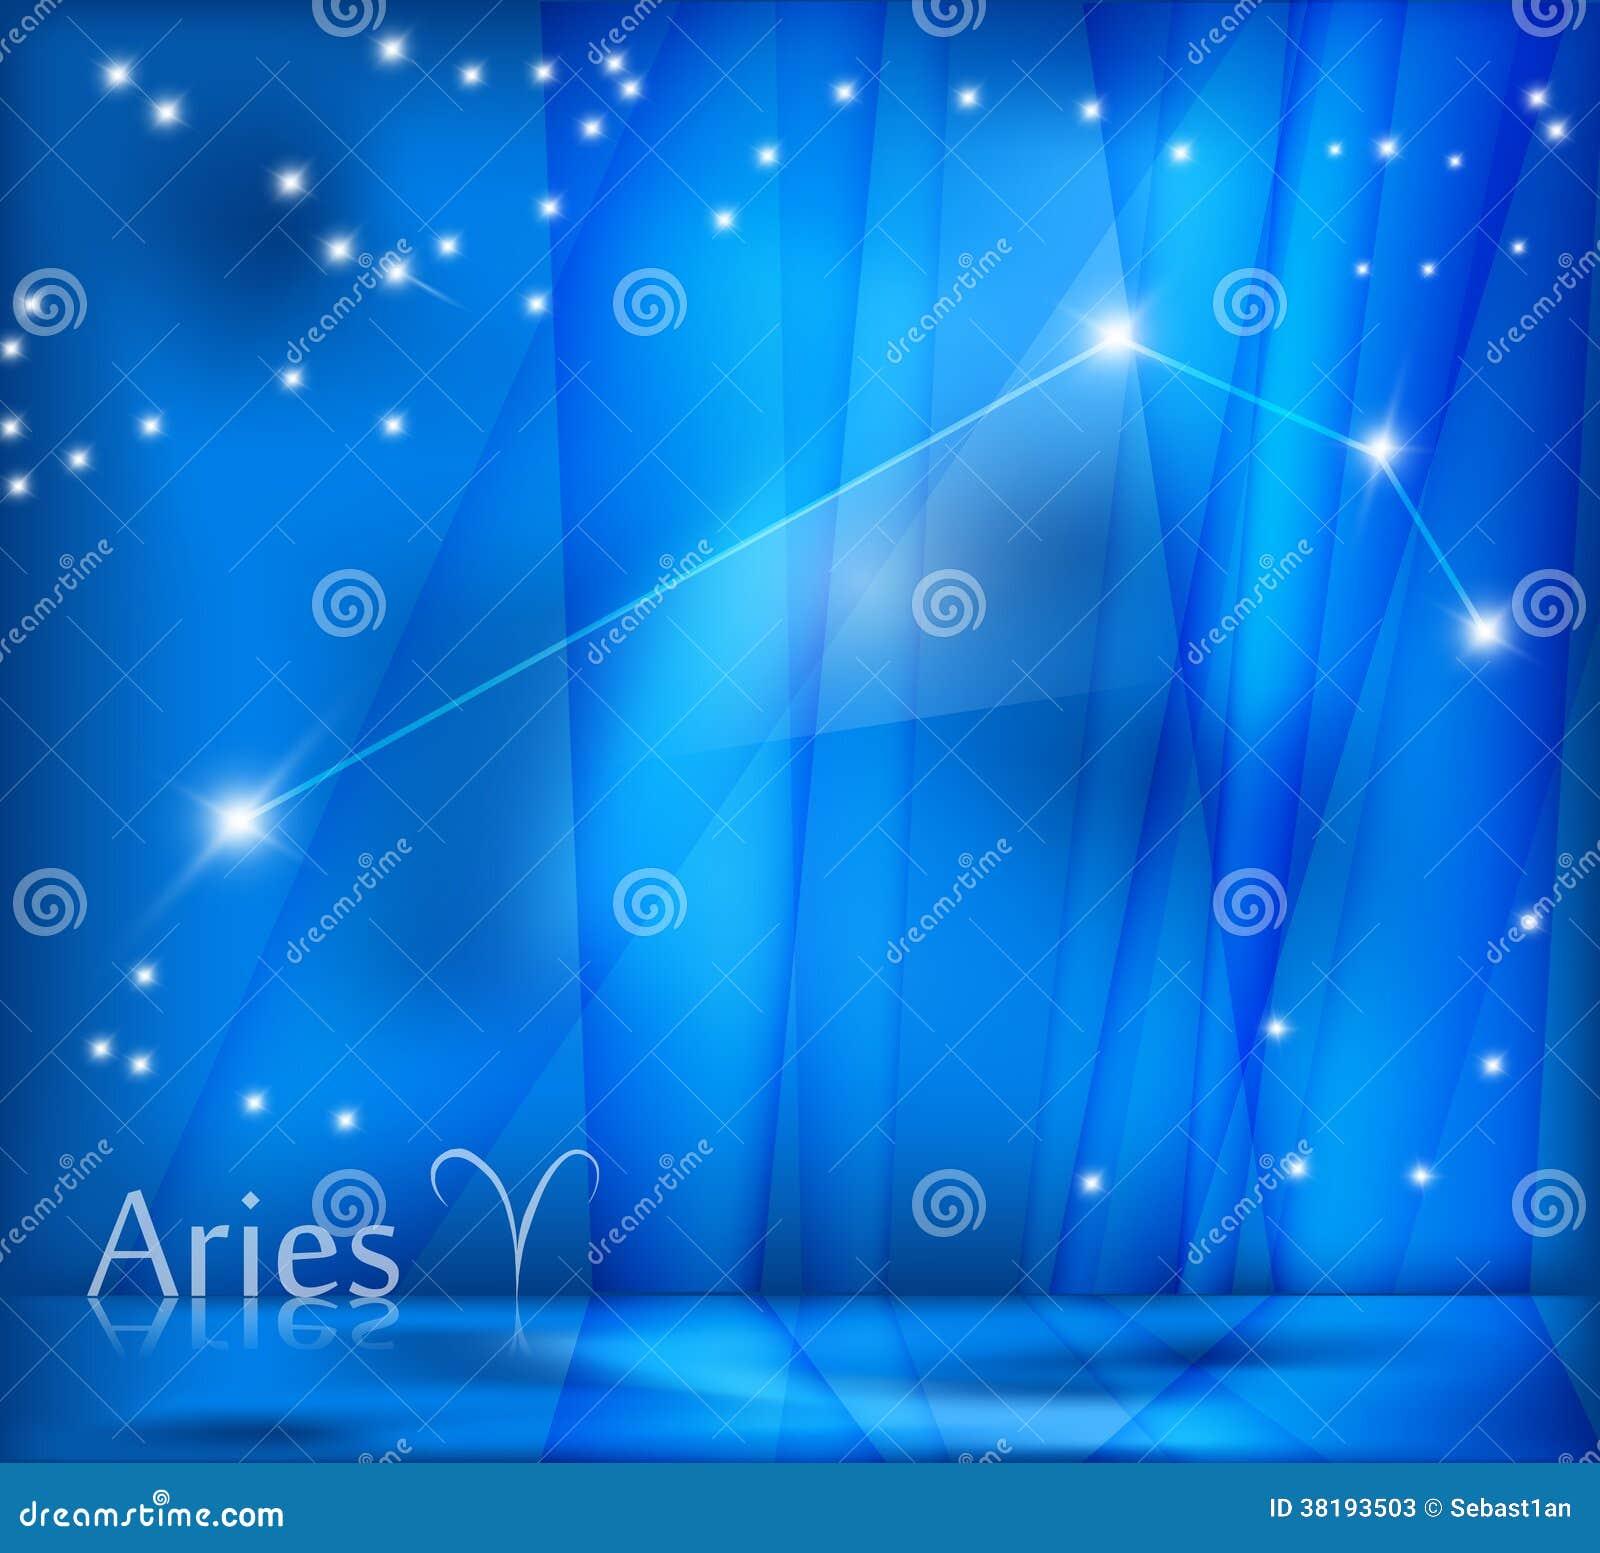 Aries Background